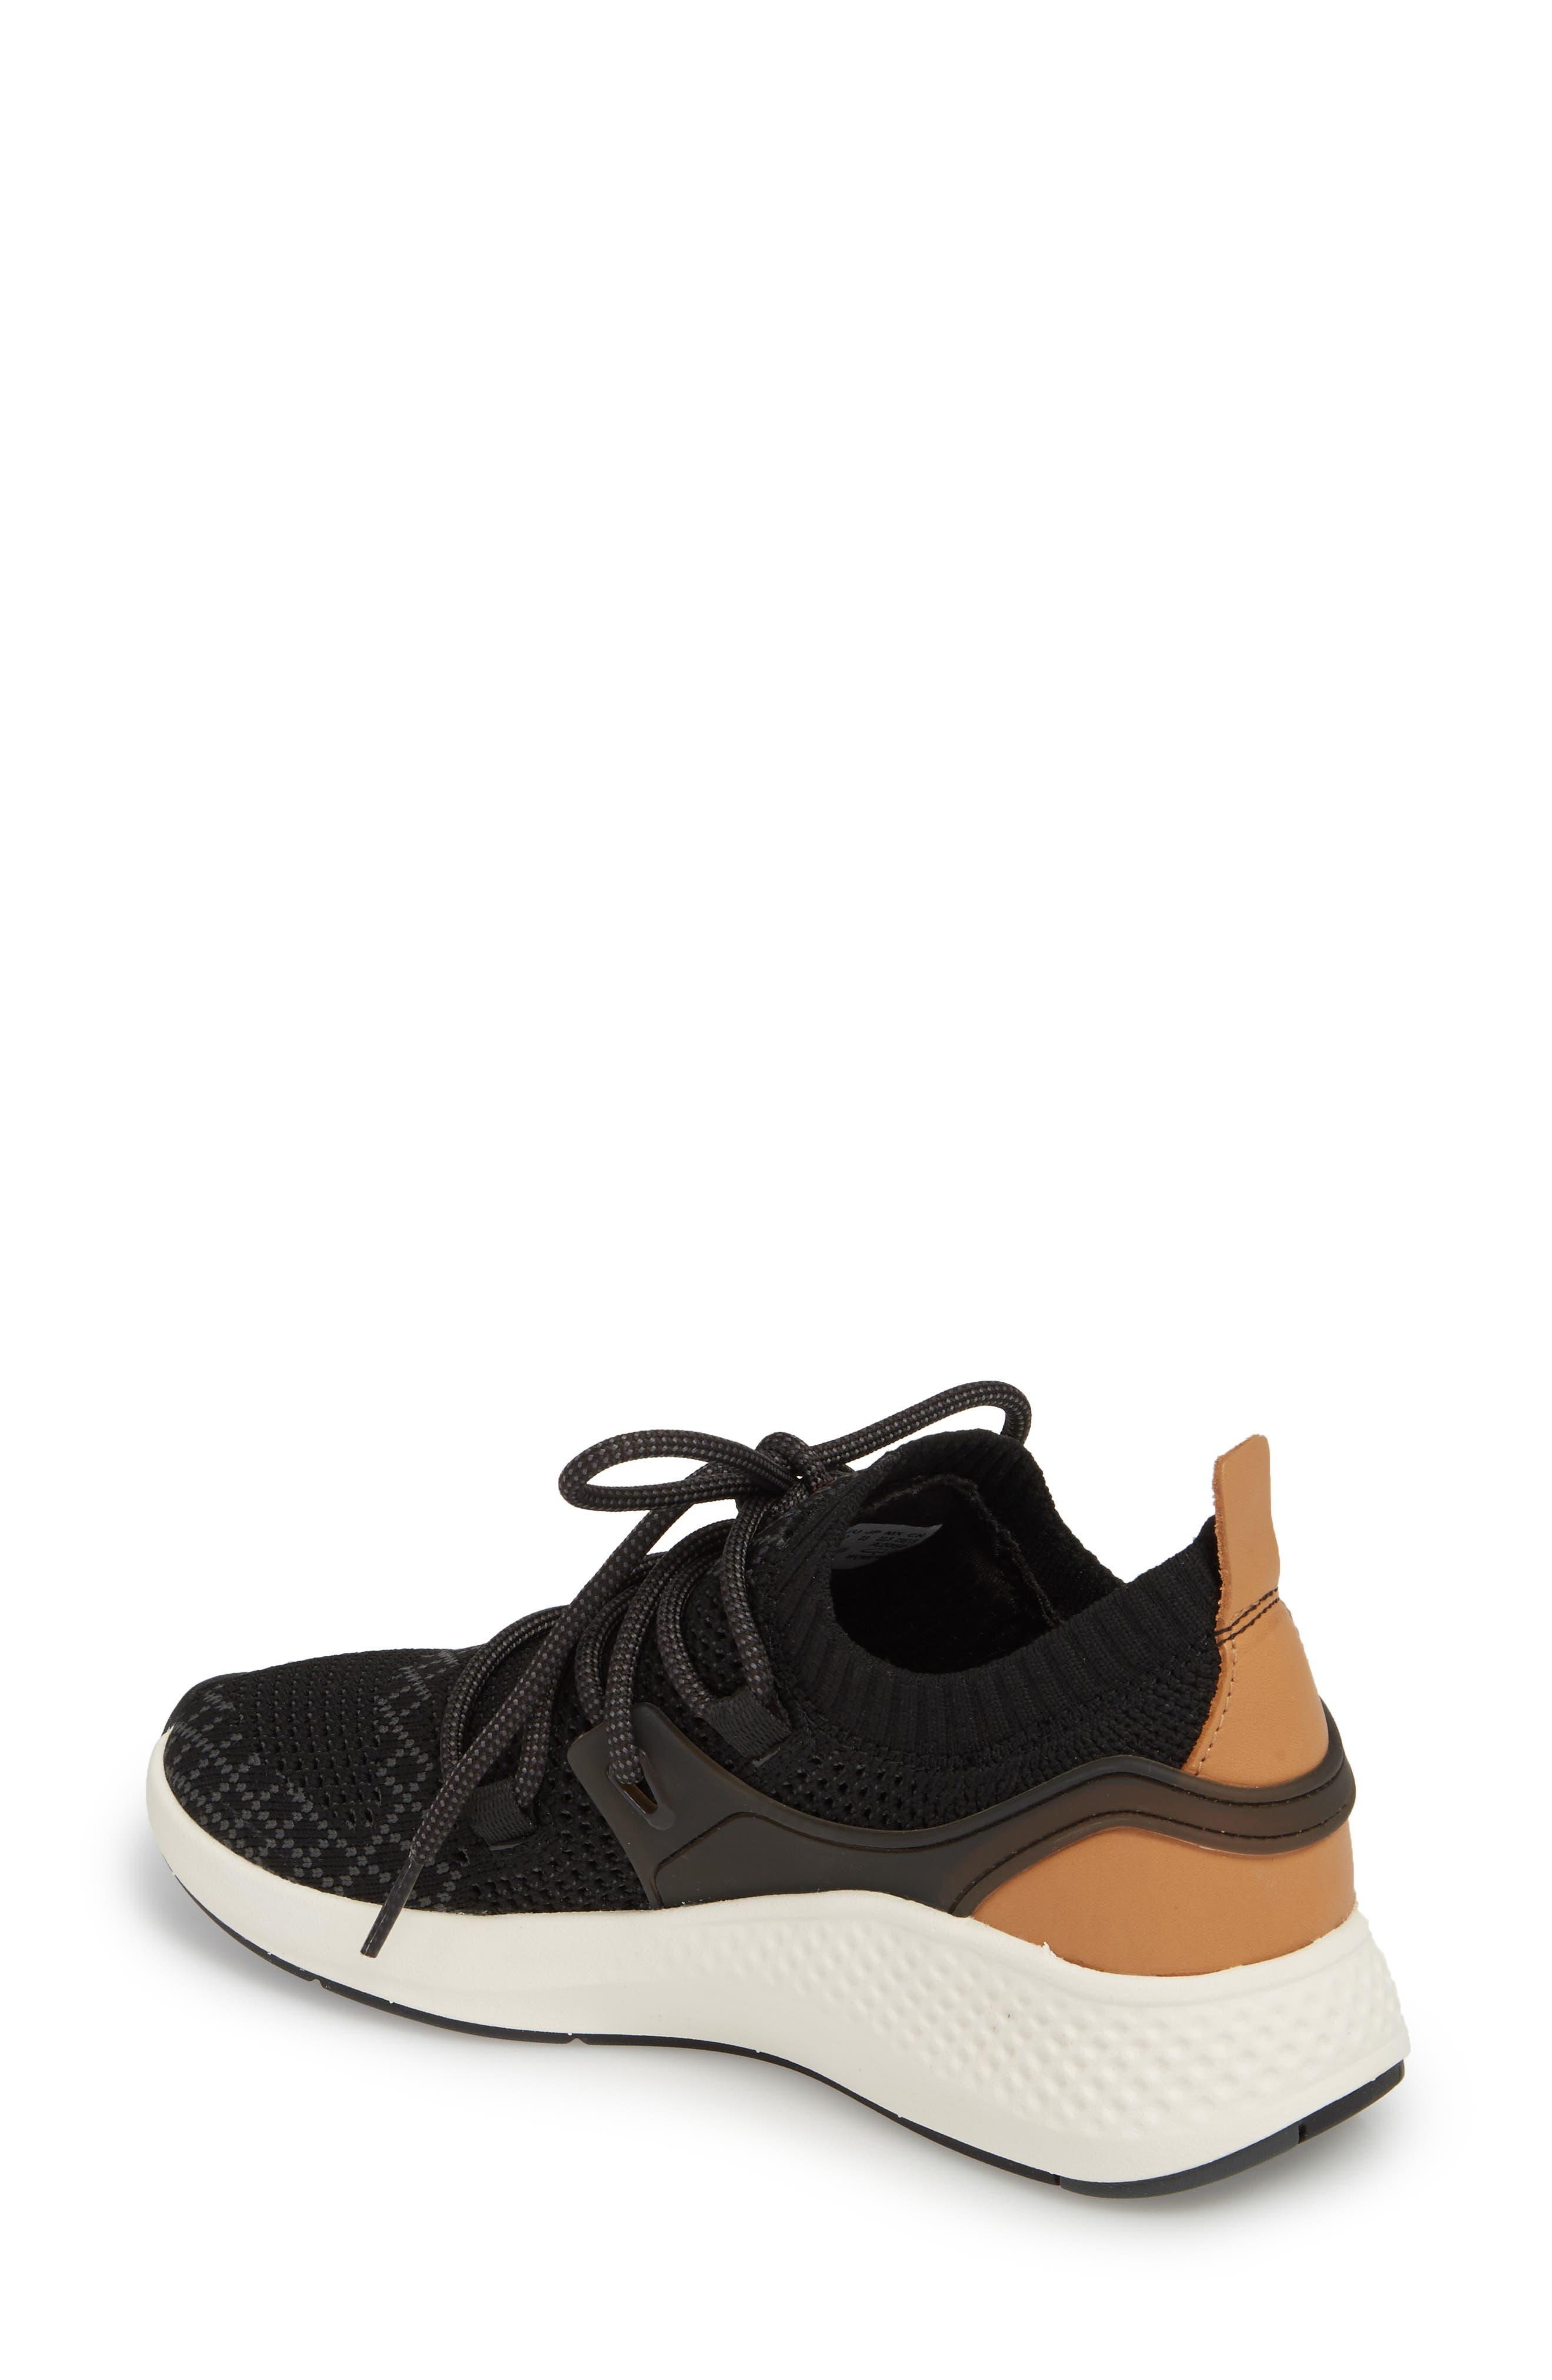 TIMBERLAND,                             FlyRoam Go Knit Sneaker,                             Alternate thumbnail 2, color,                             001